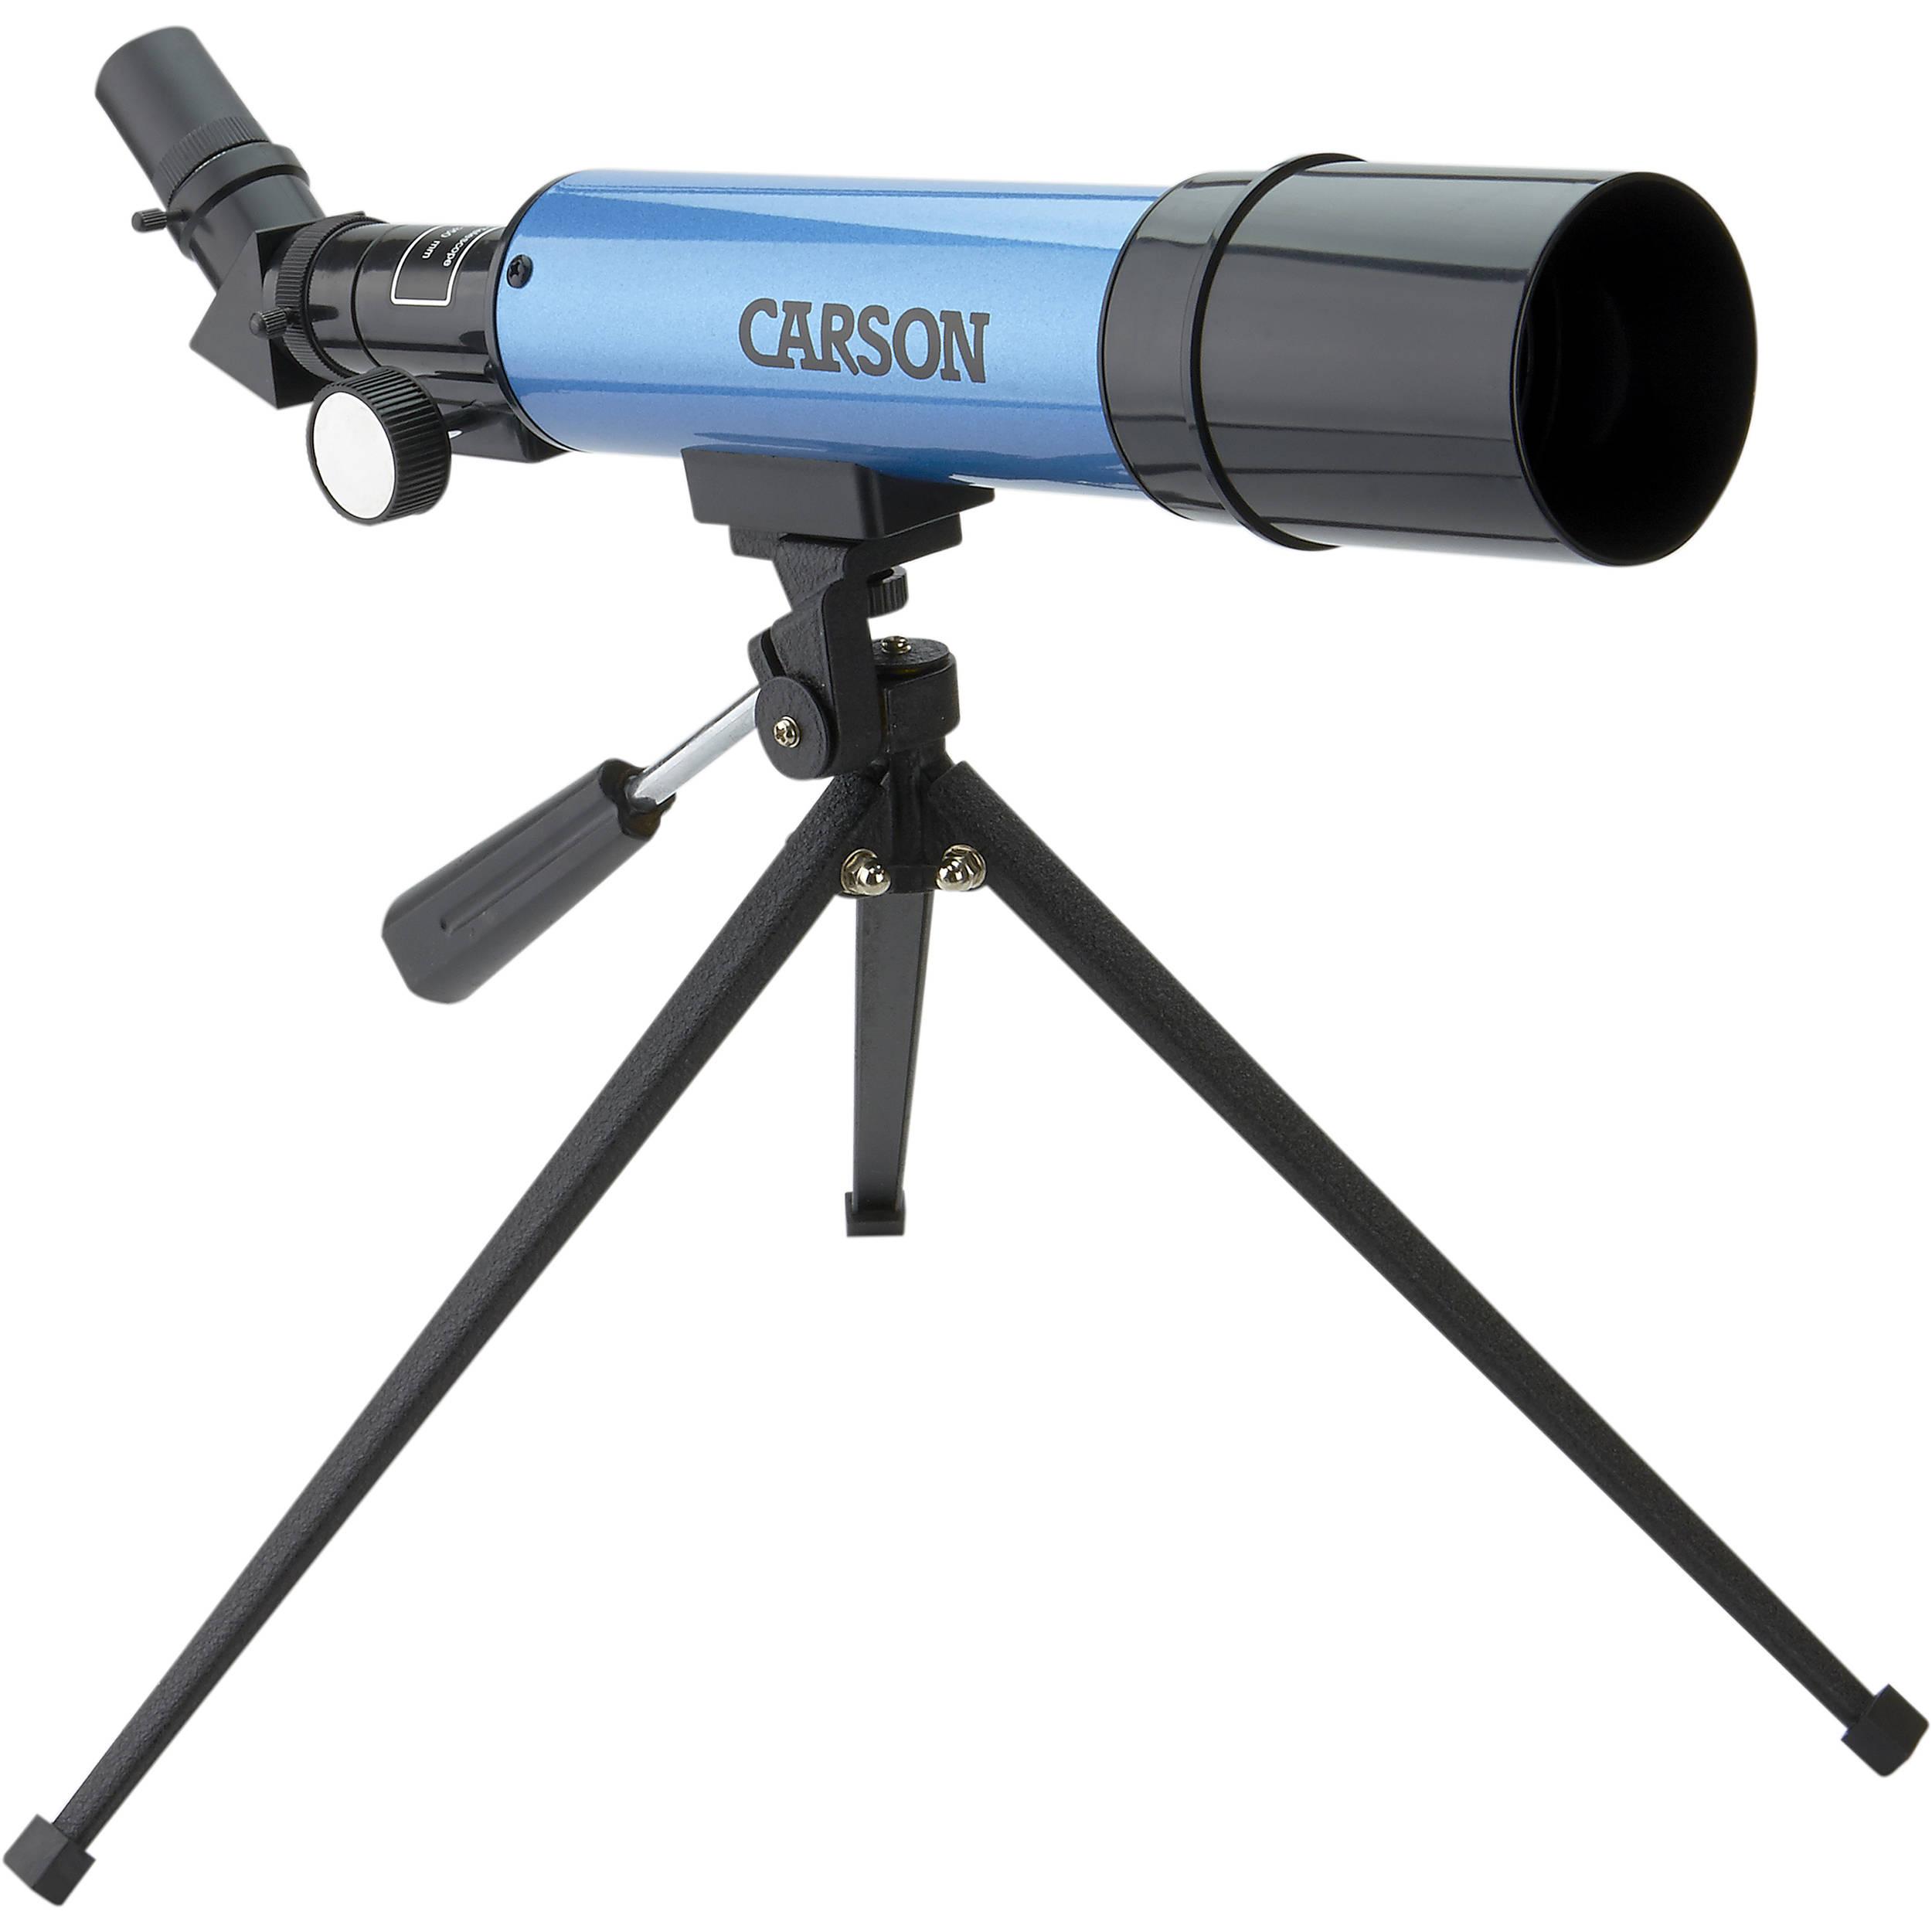 Elegant Carson Aim 50mm F/7 Refractor Telescope